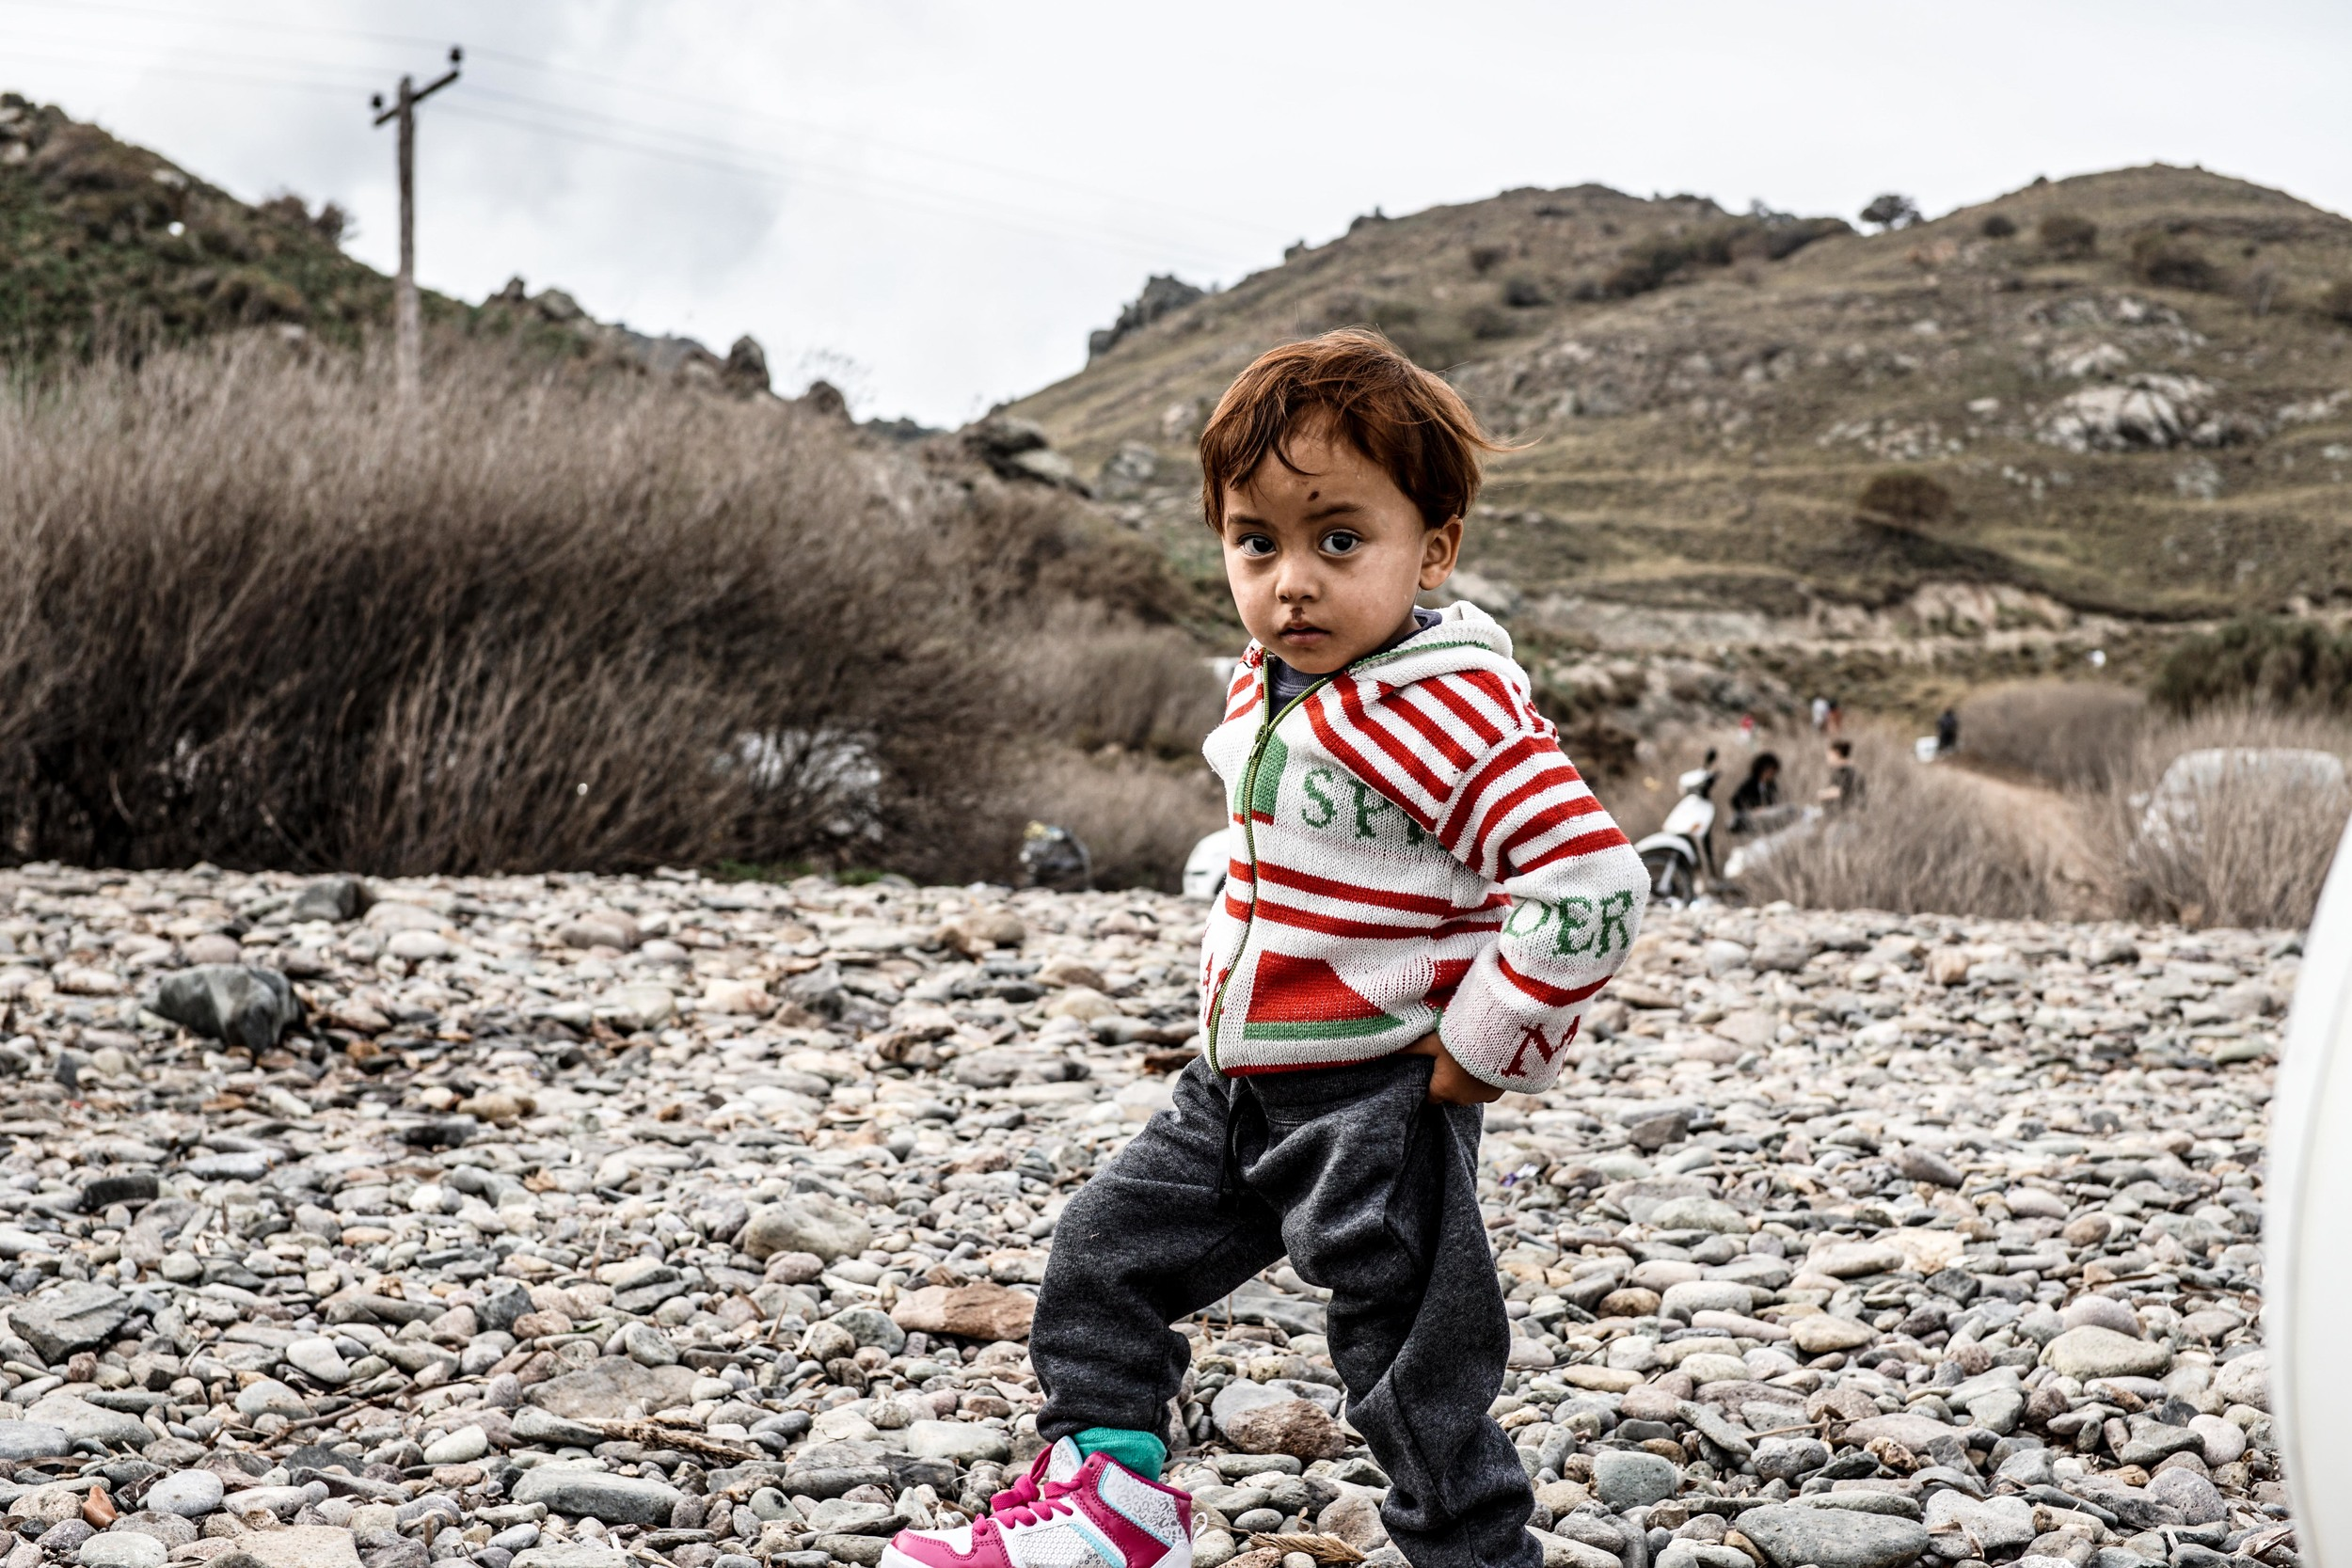 Syrian Refugee Crisis Lesbos Greece November 2015 4.jpg